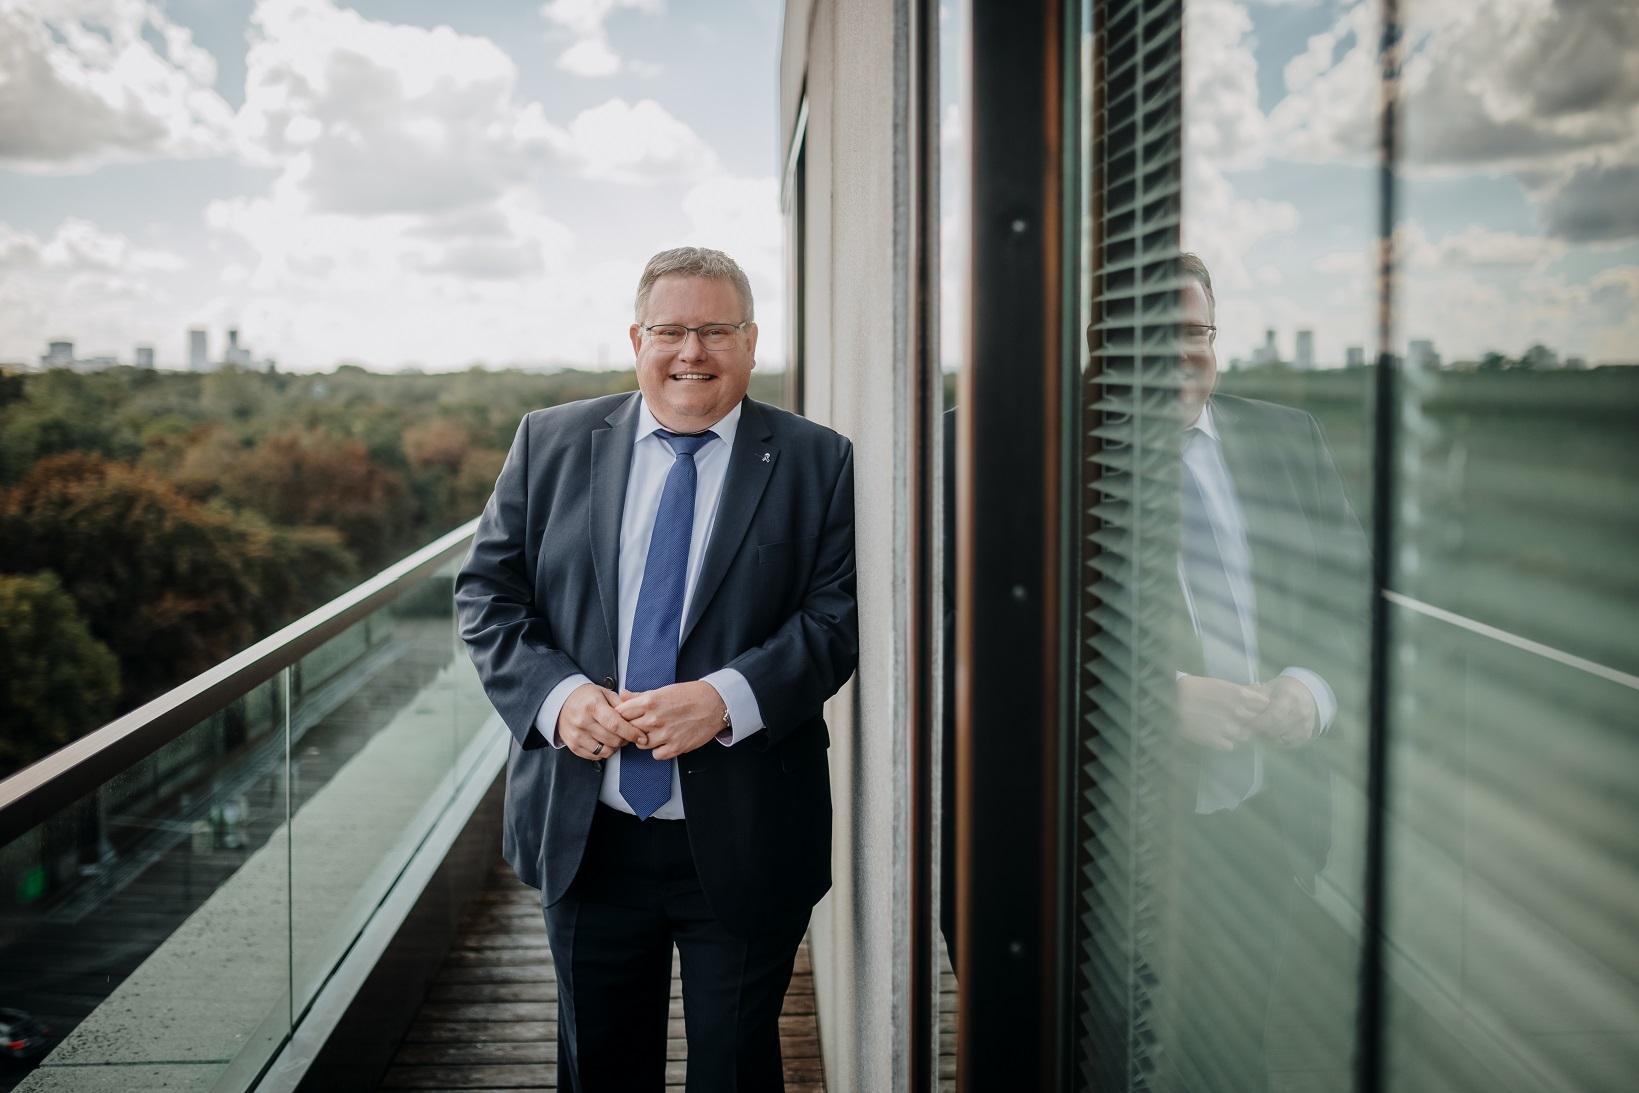 Bundestagsabgeordneter Markus Uhl ist Mitglied im Parlamentskreis Biosphärenreservate